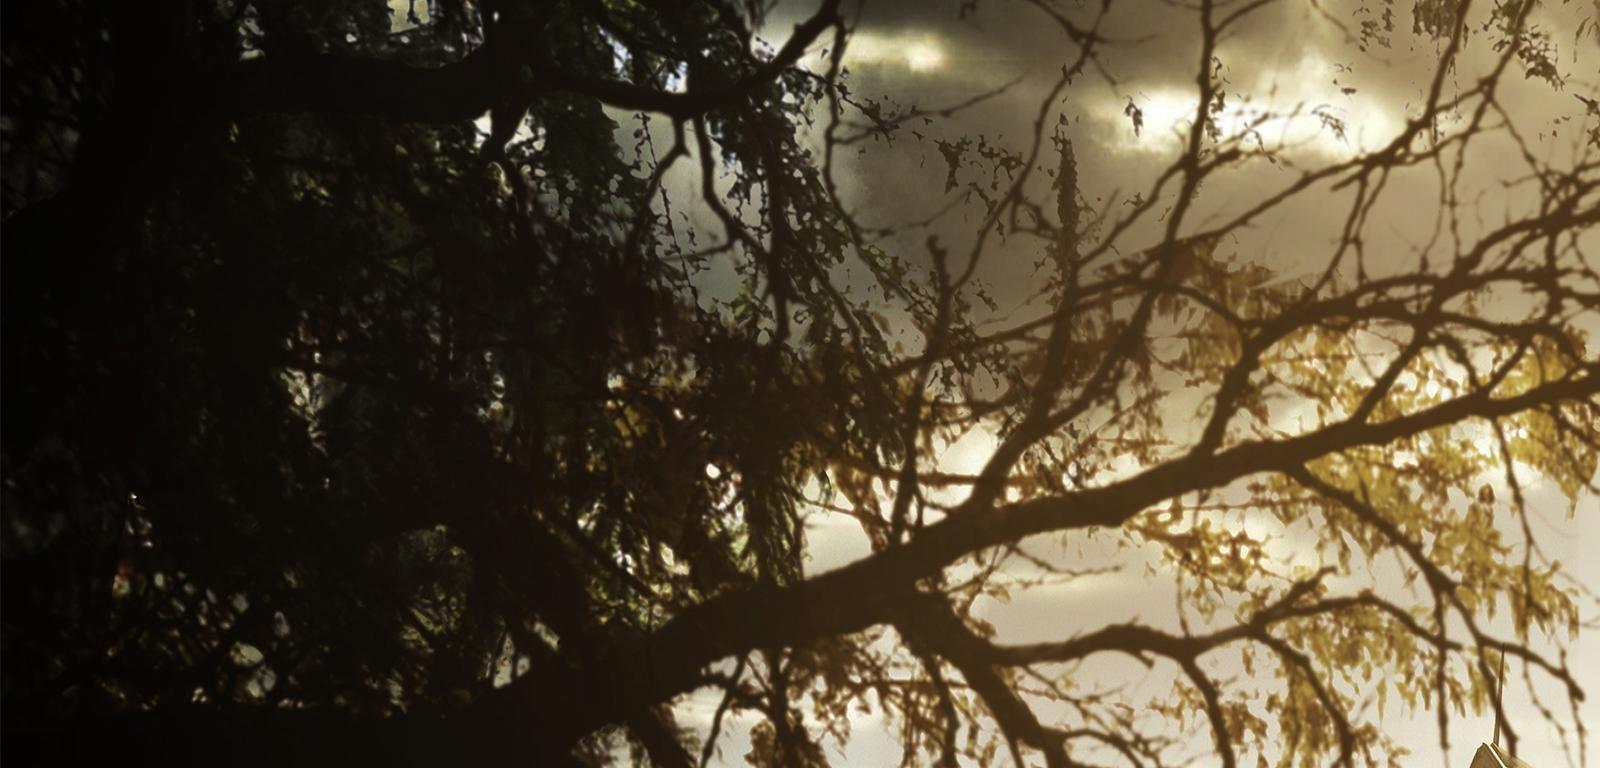 Resident Evil 7 Biohazard Wallpapers Hd For Desktop Backgrounds